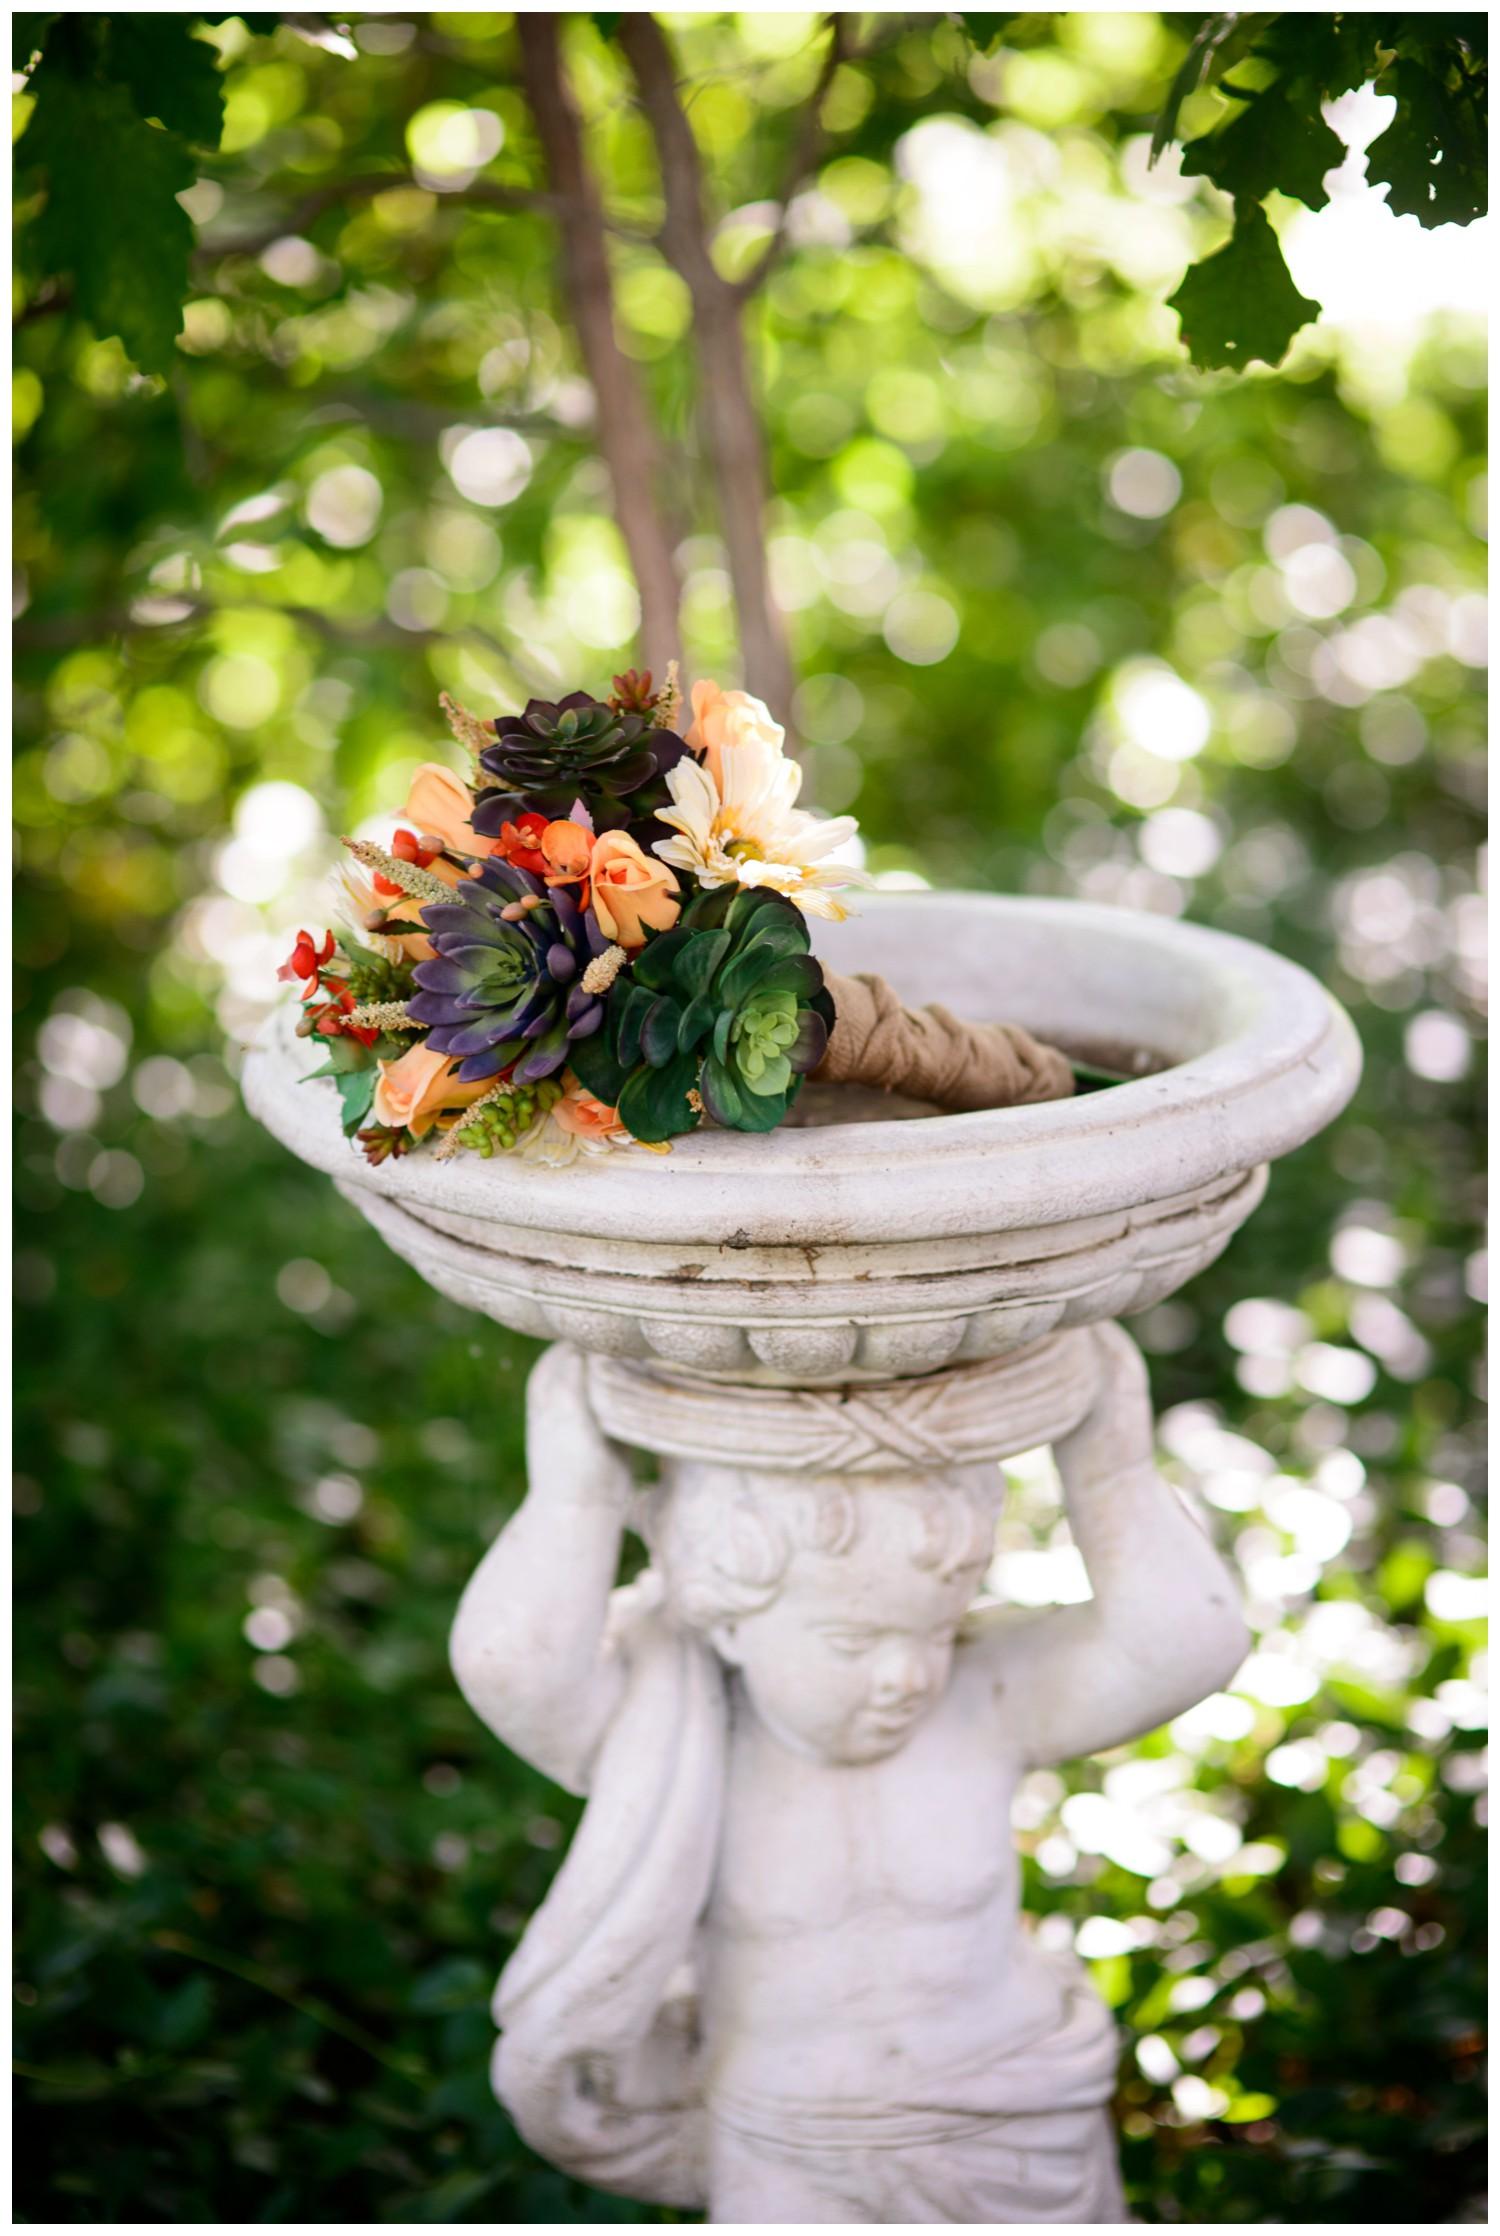 Morningside-manor-colorado-outdoor-wedding-photography_0012.jpg